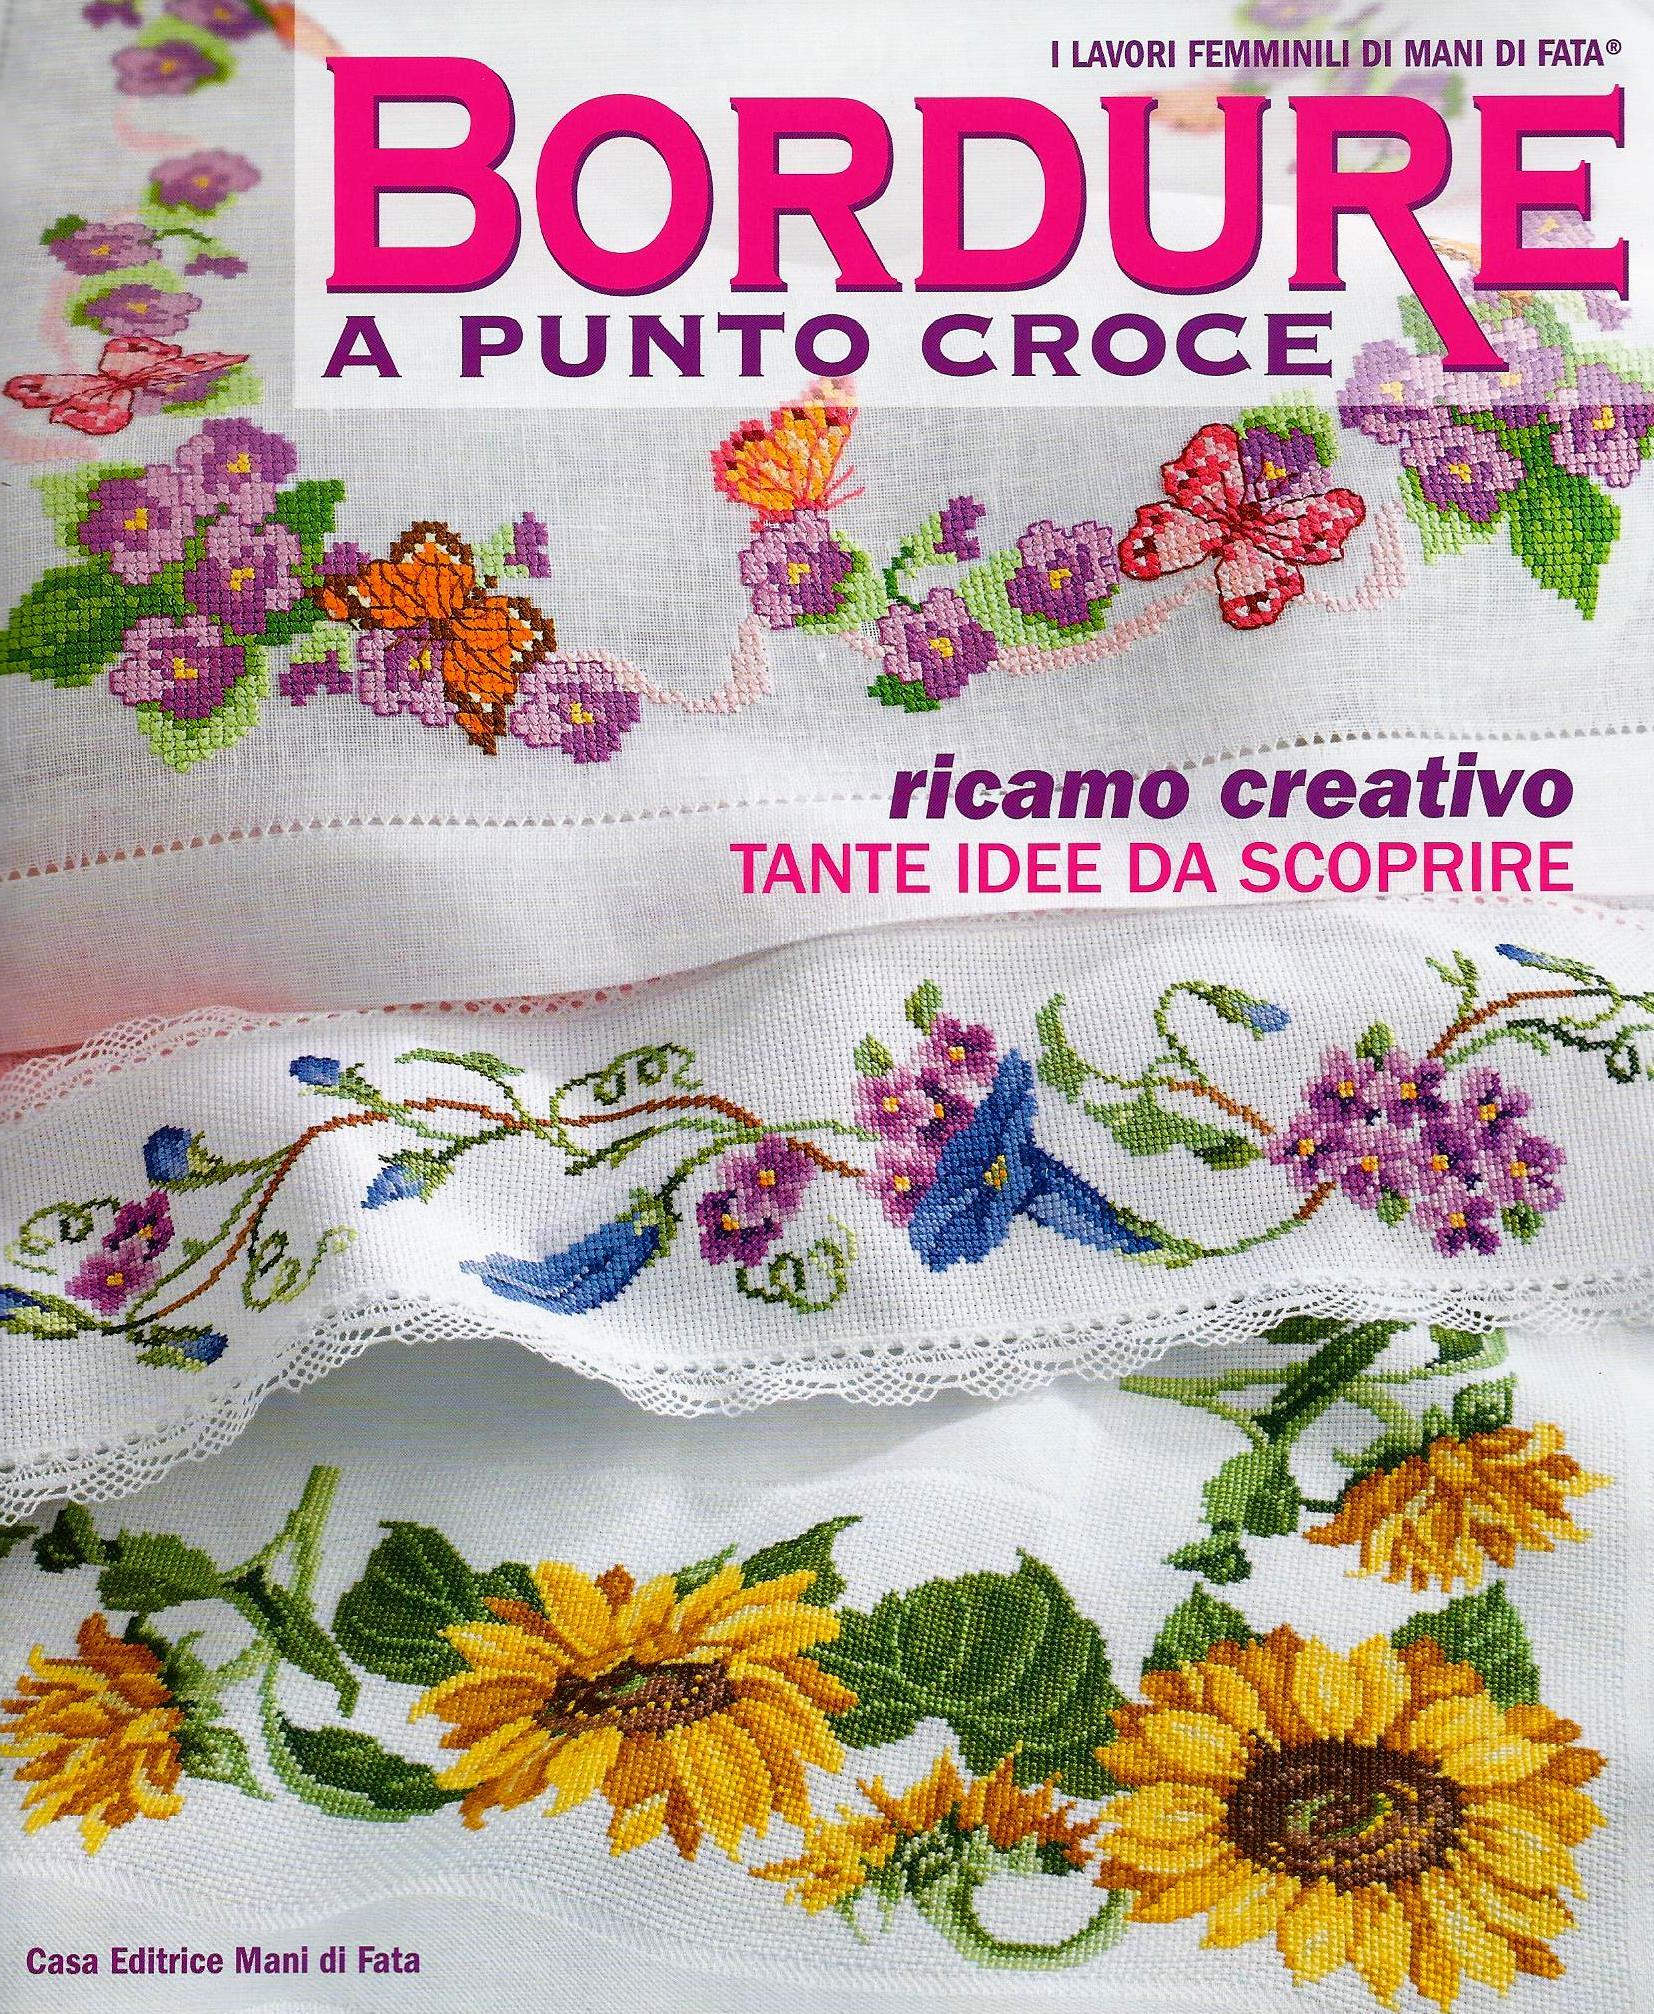 BORDURE A PUNTO CROCE. - Kč 290